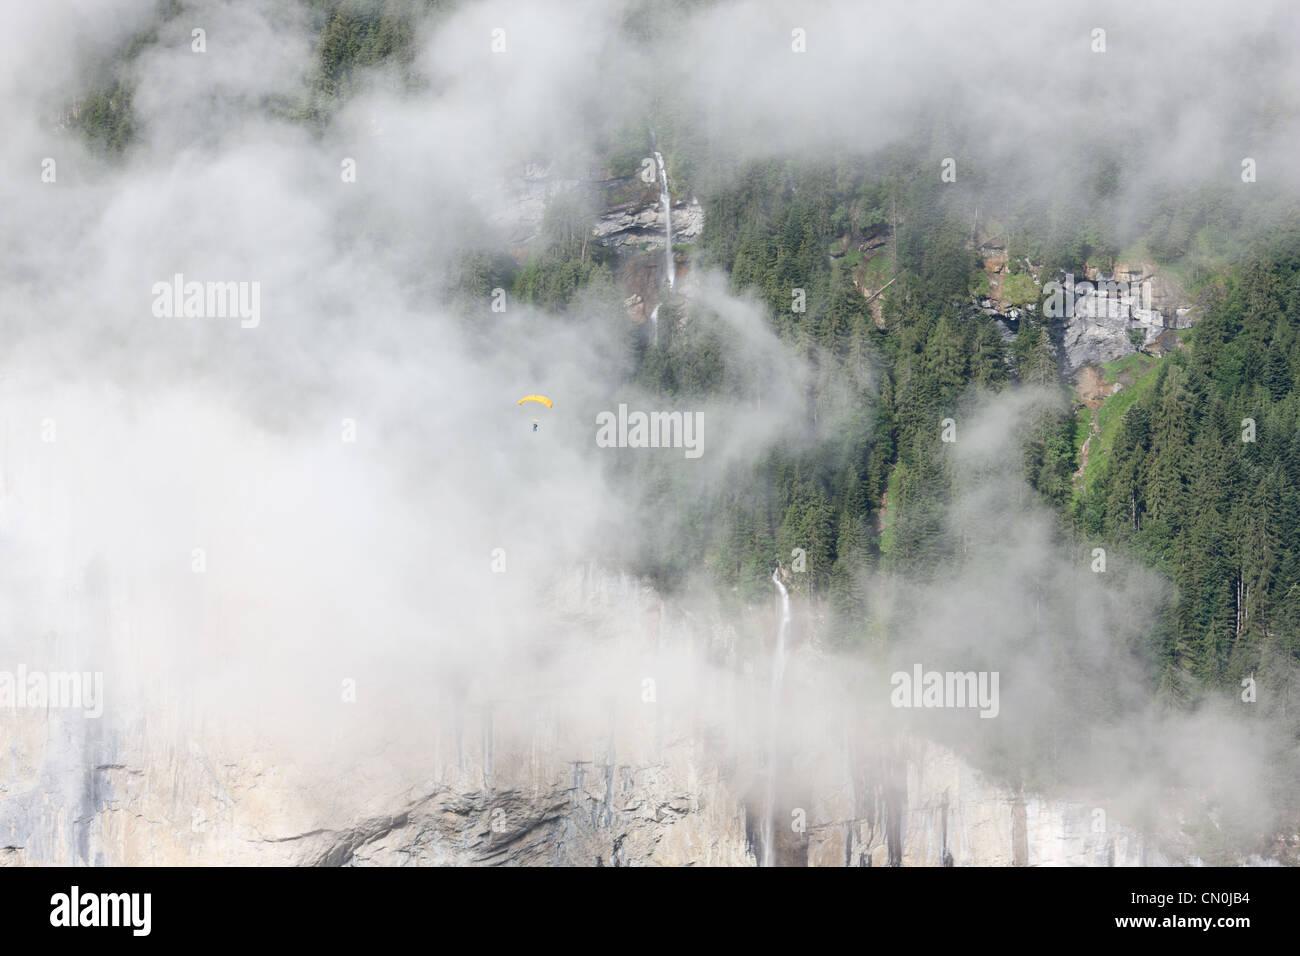 SKYDIVER / PARACHUTIST soaring by the Staubbachfall over the Lauterbrunnen Valley, Bern, Switzerlland. - Stock Image